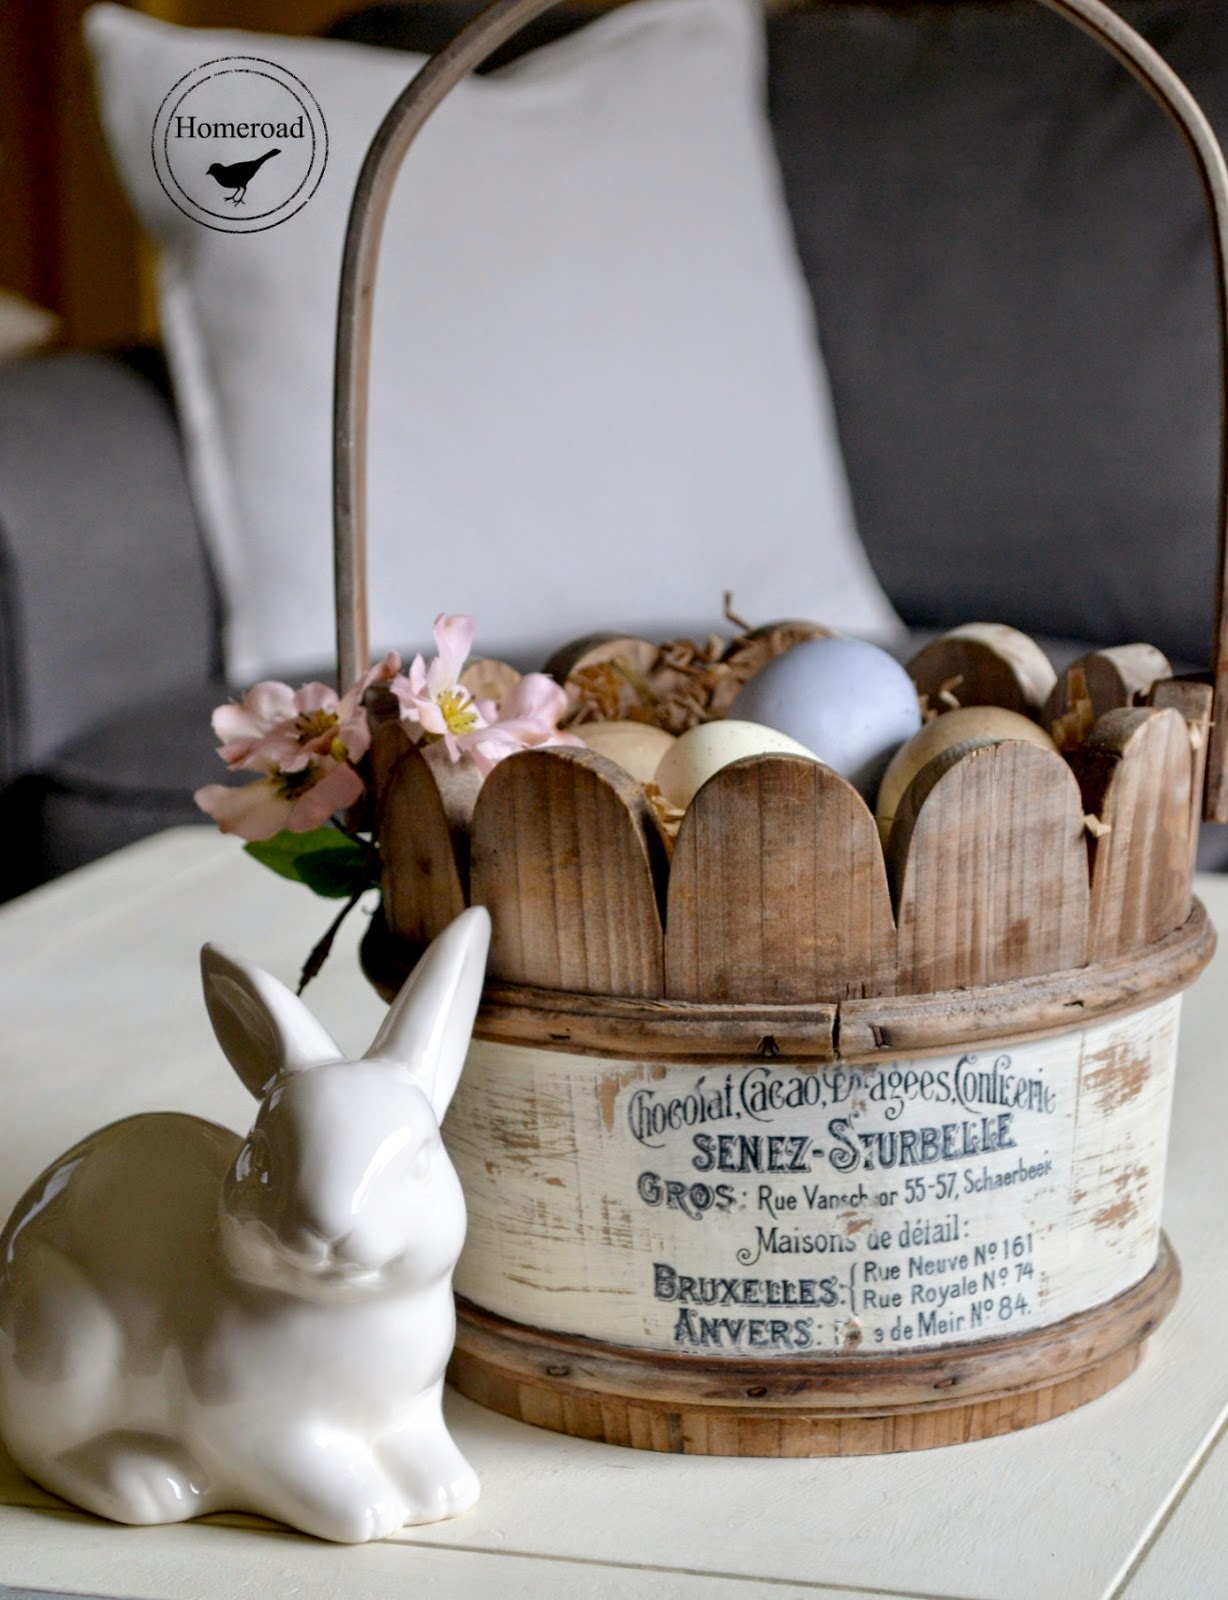 Wooden Easter Basket and a Transfer www.homeroad.net